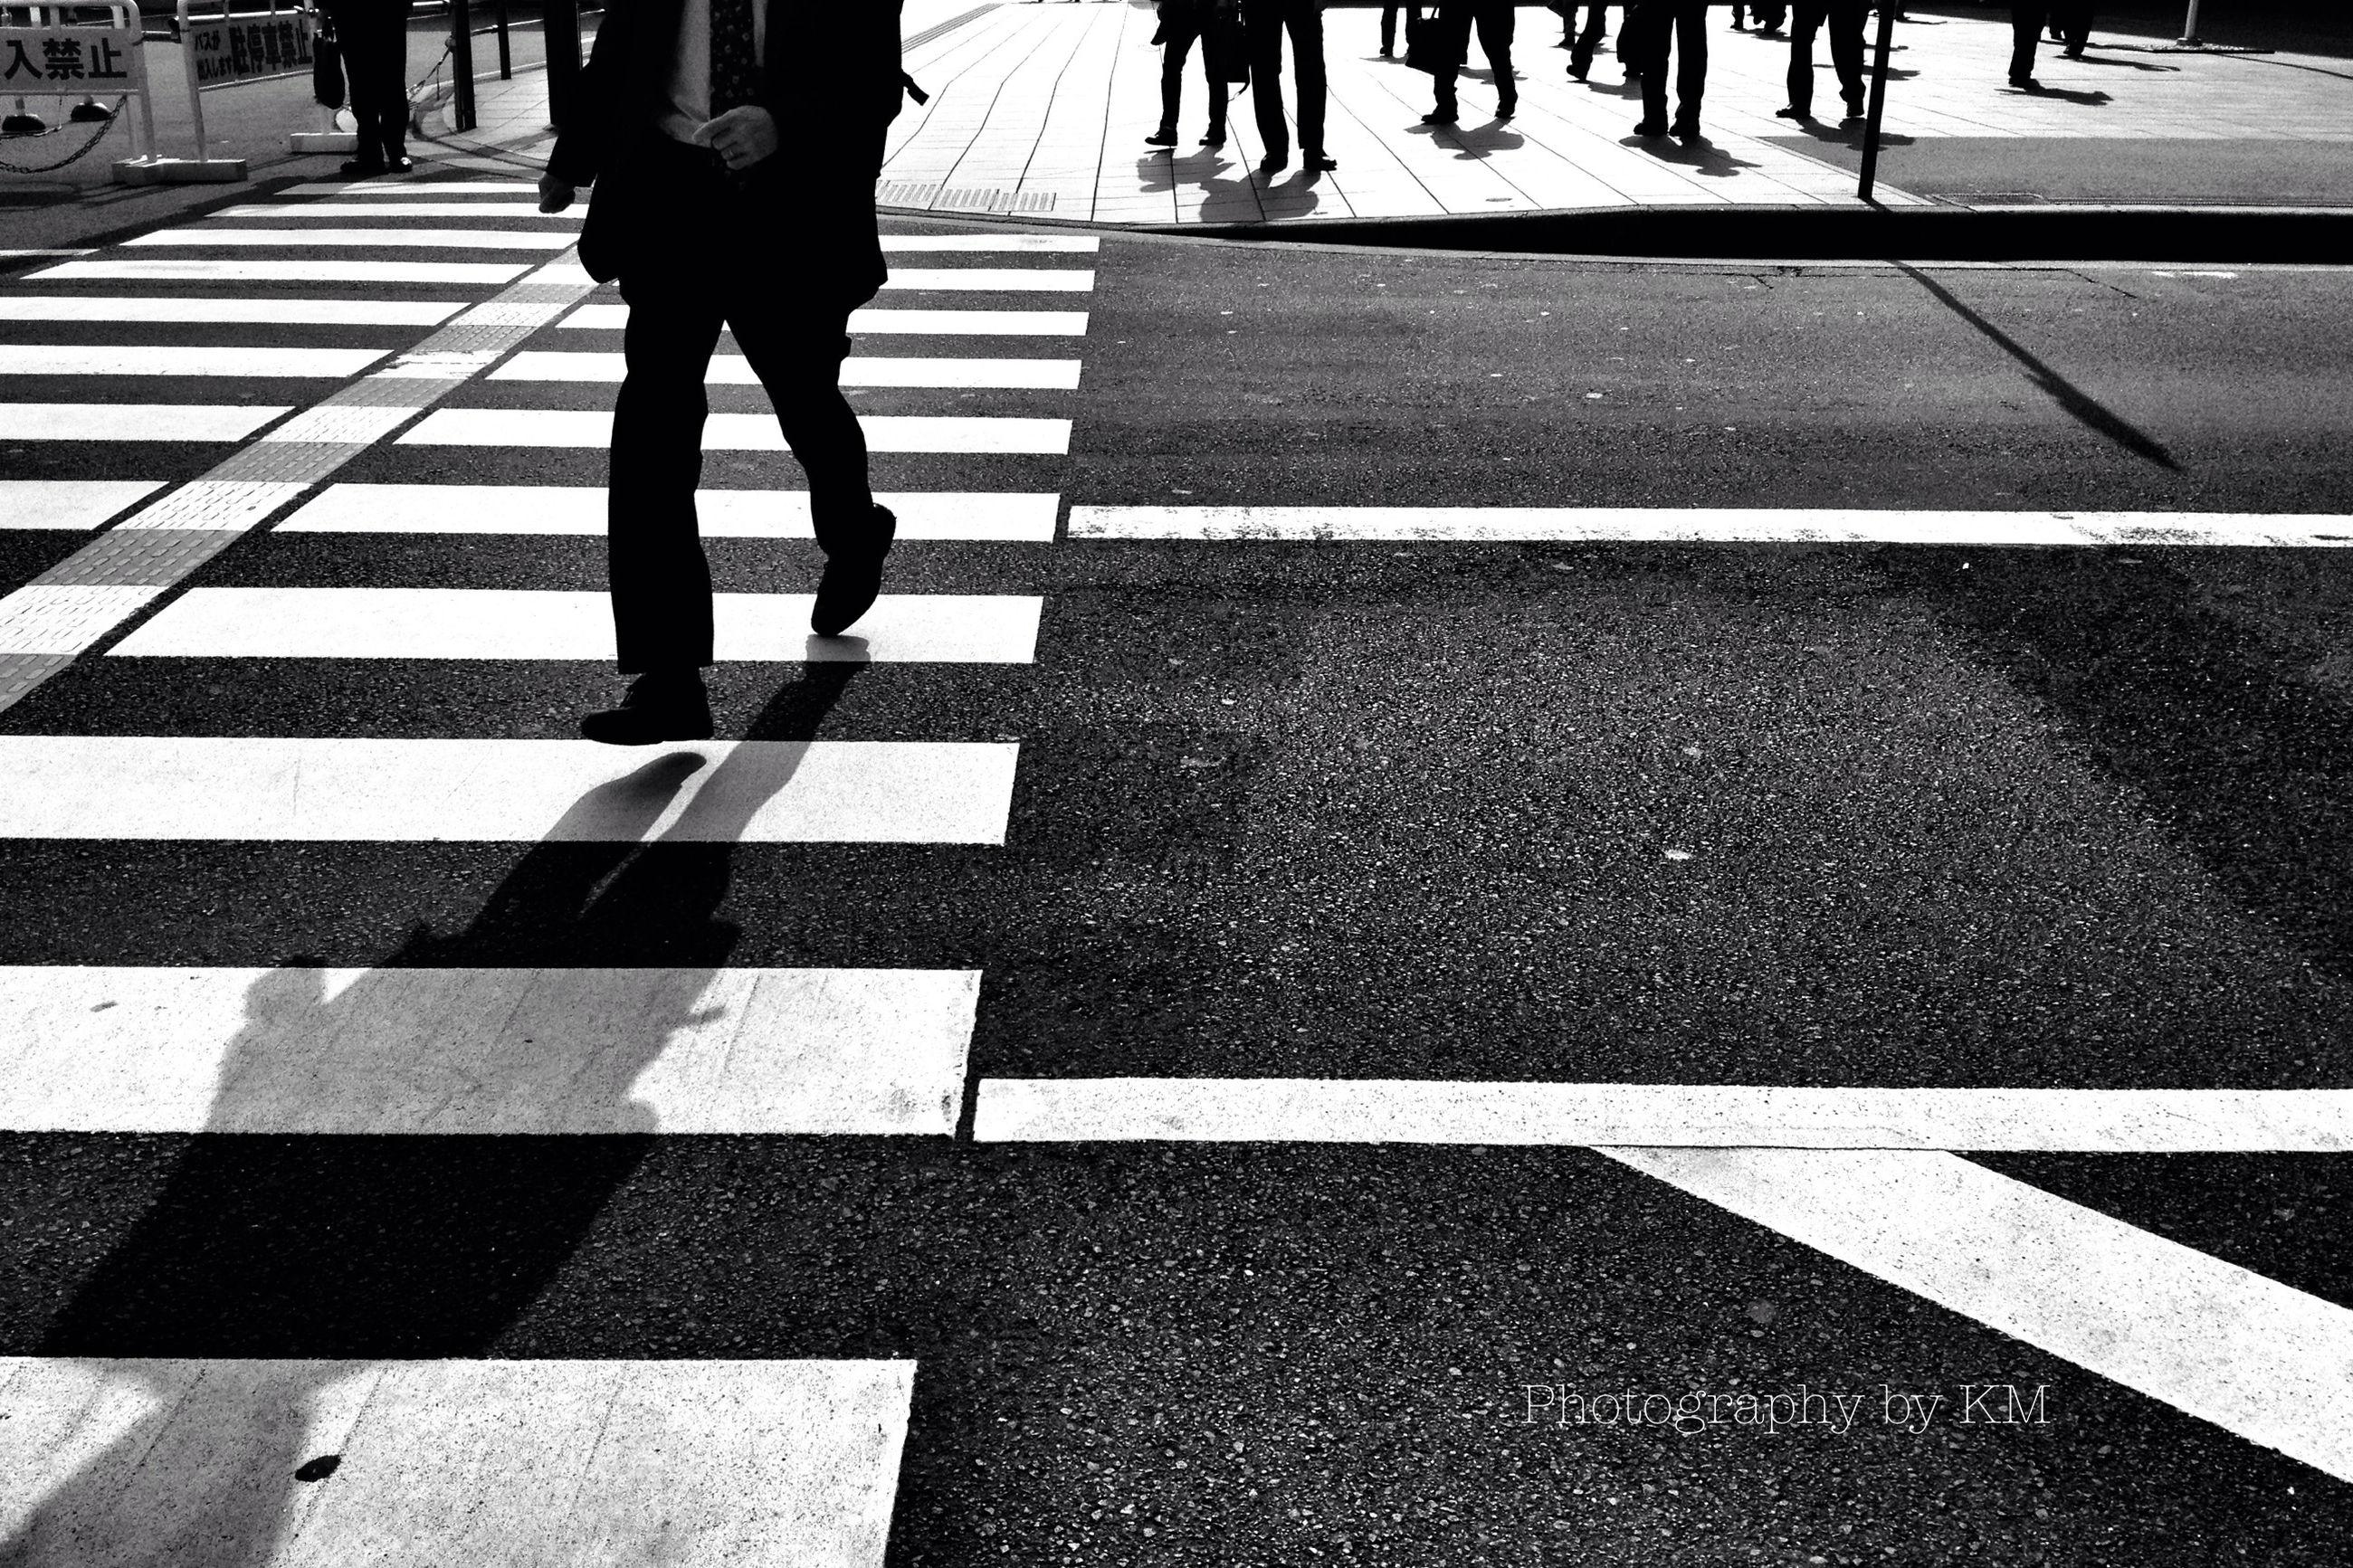 road marking, street, road, zebra crossing, walking, transportation, low section, asphalt, shadow, men, lifestyles, city life, person, sunlight, crosswalk, the way forward, crossing